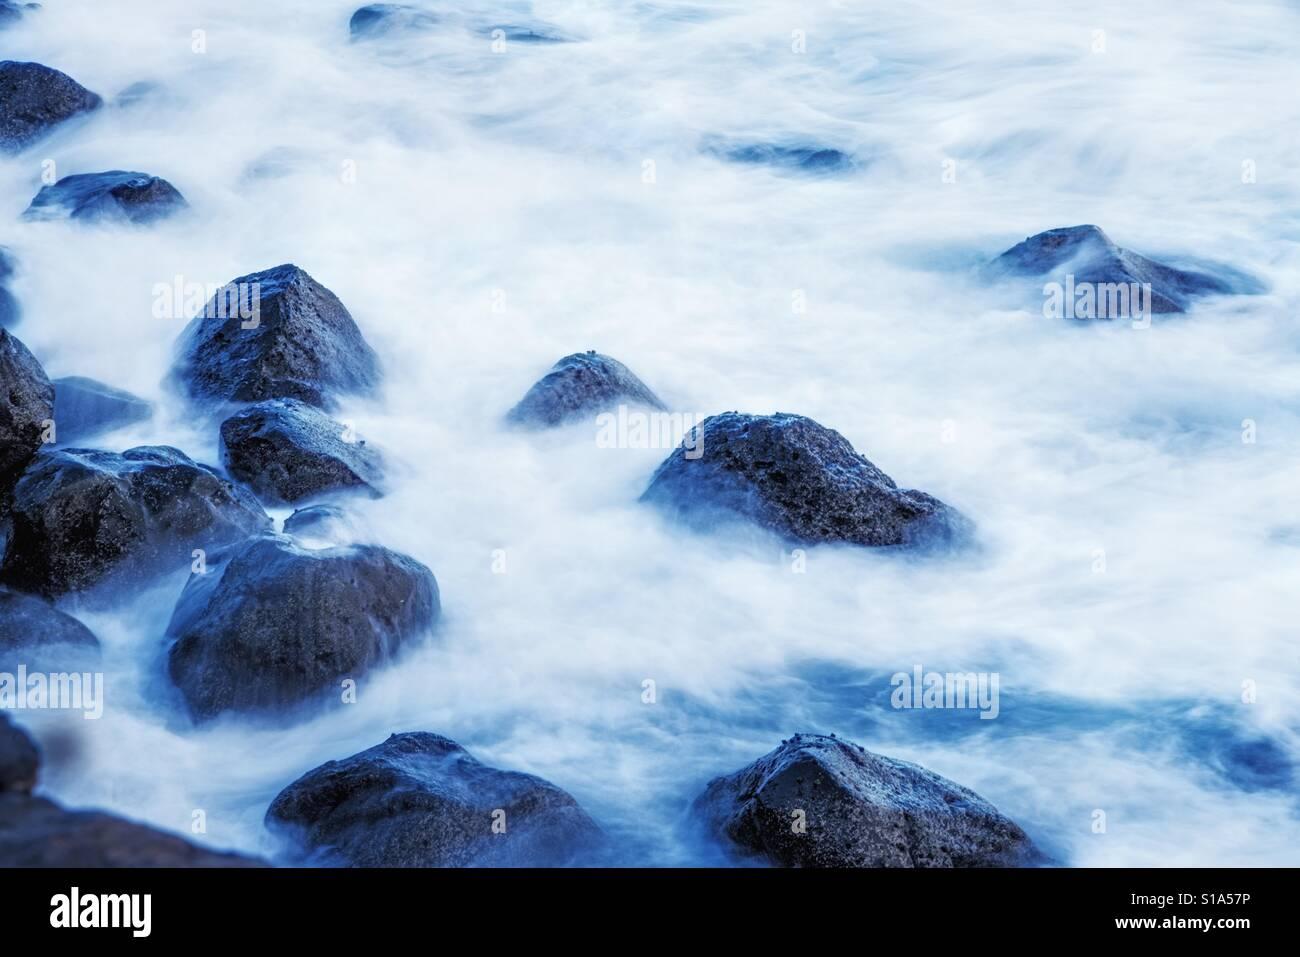 atlantic ocean, volcano rocks in surf on longtime exposure - Stock Image